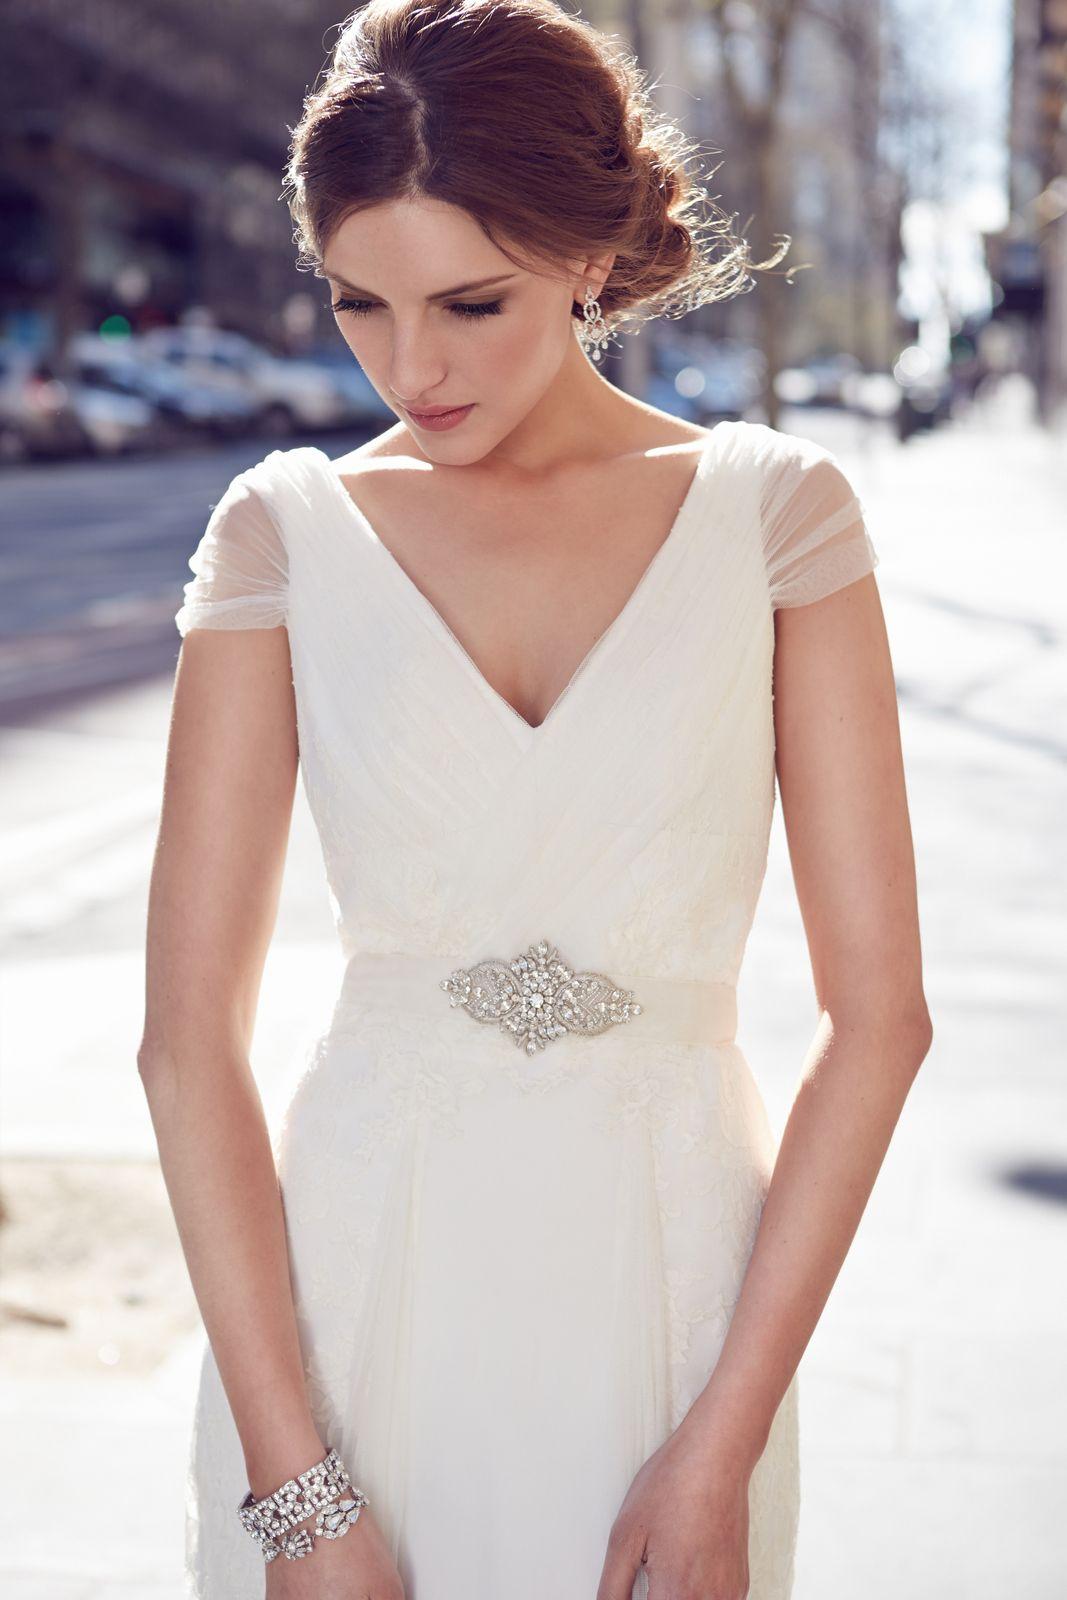 Penrith bridal centre karen willis holmes gown lyla vintage